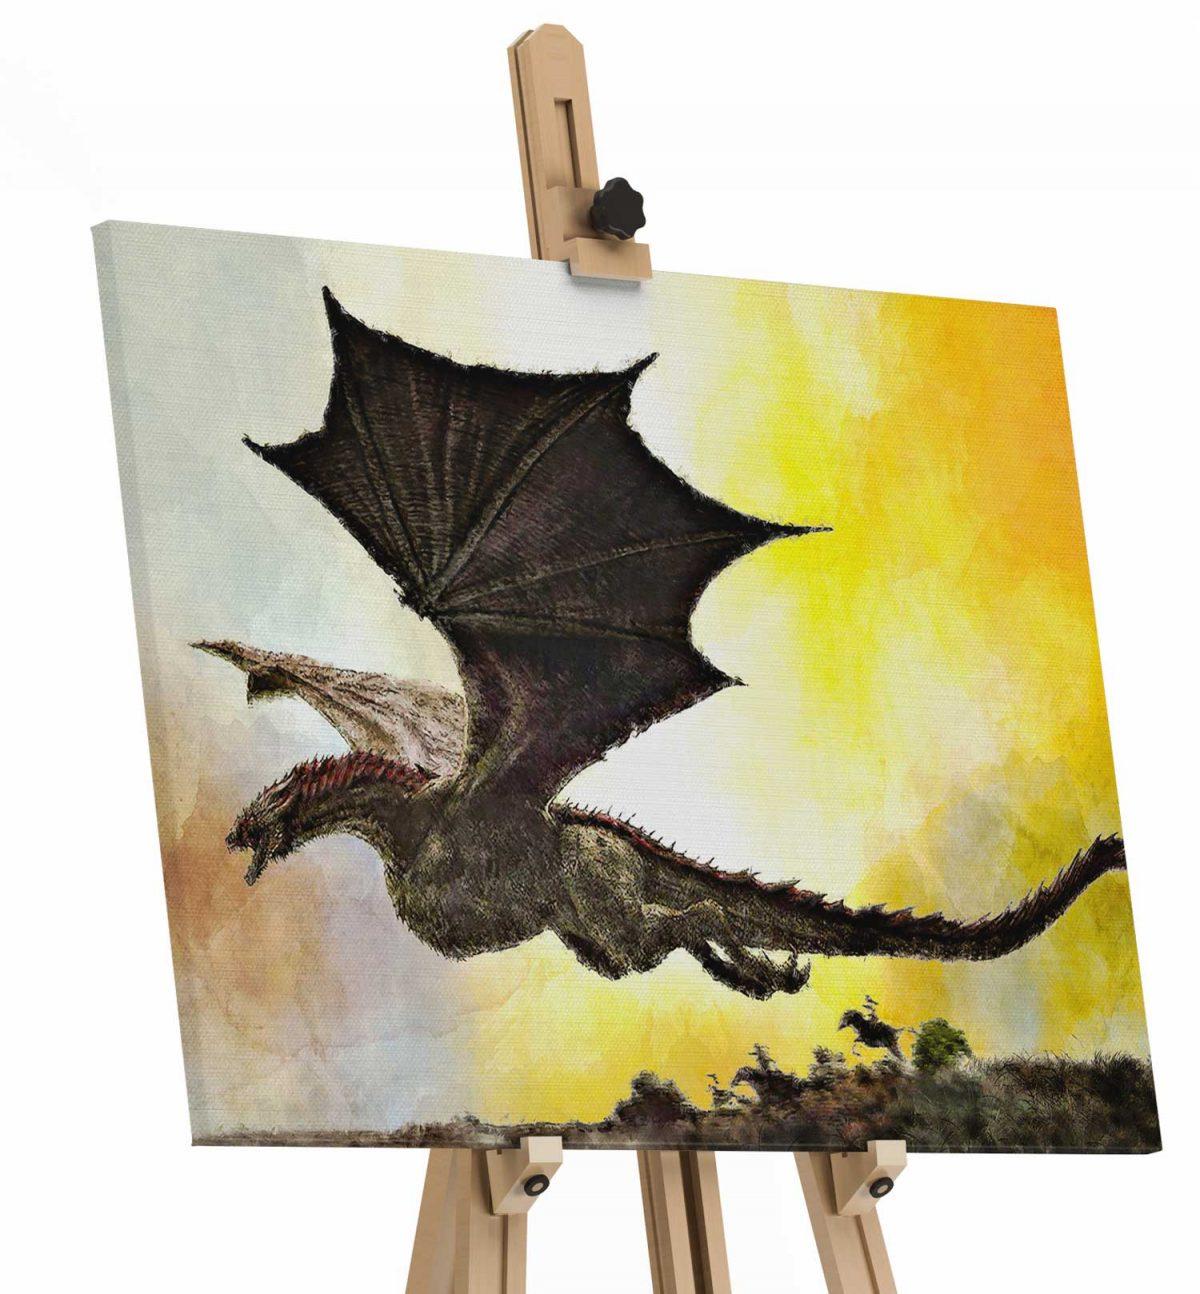 Quadro DRONGON tela de pintura